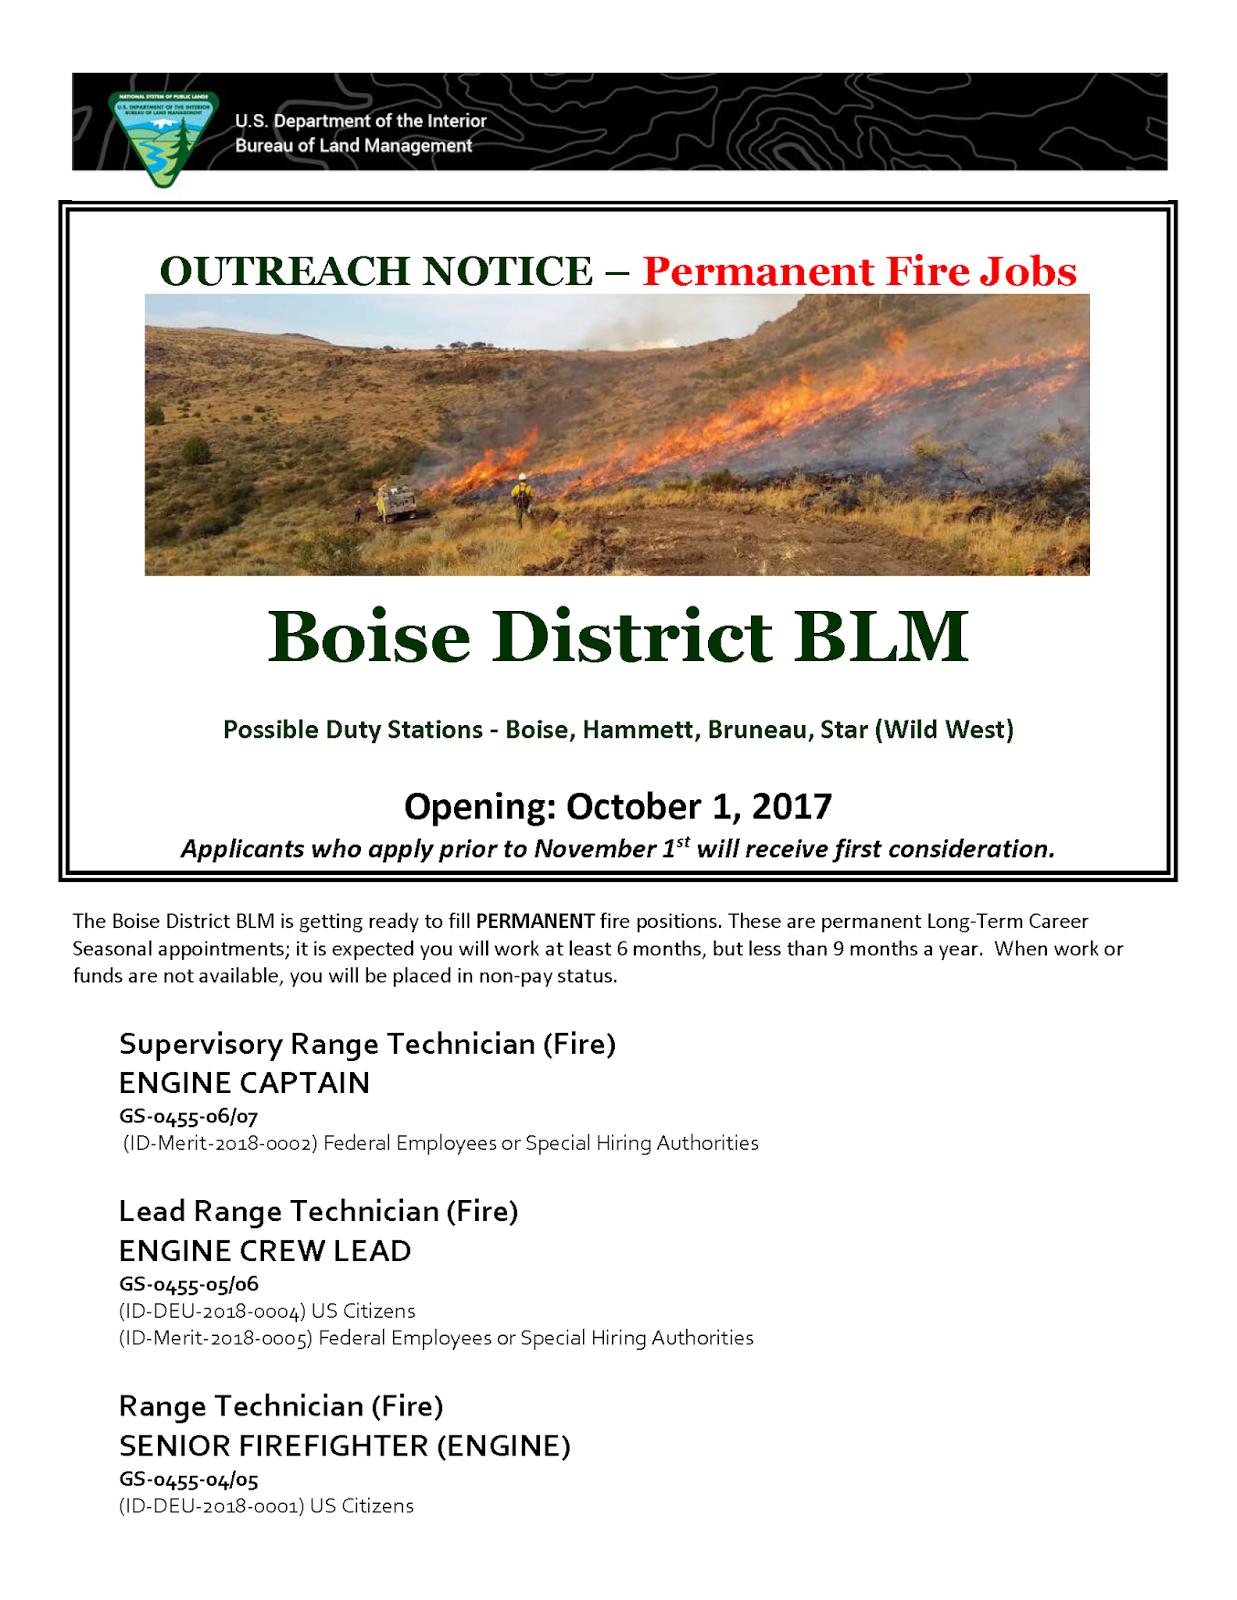 Idaho Fire Information - Fire map southeast us